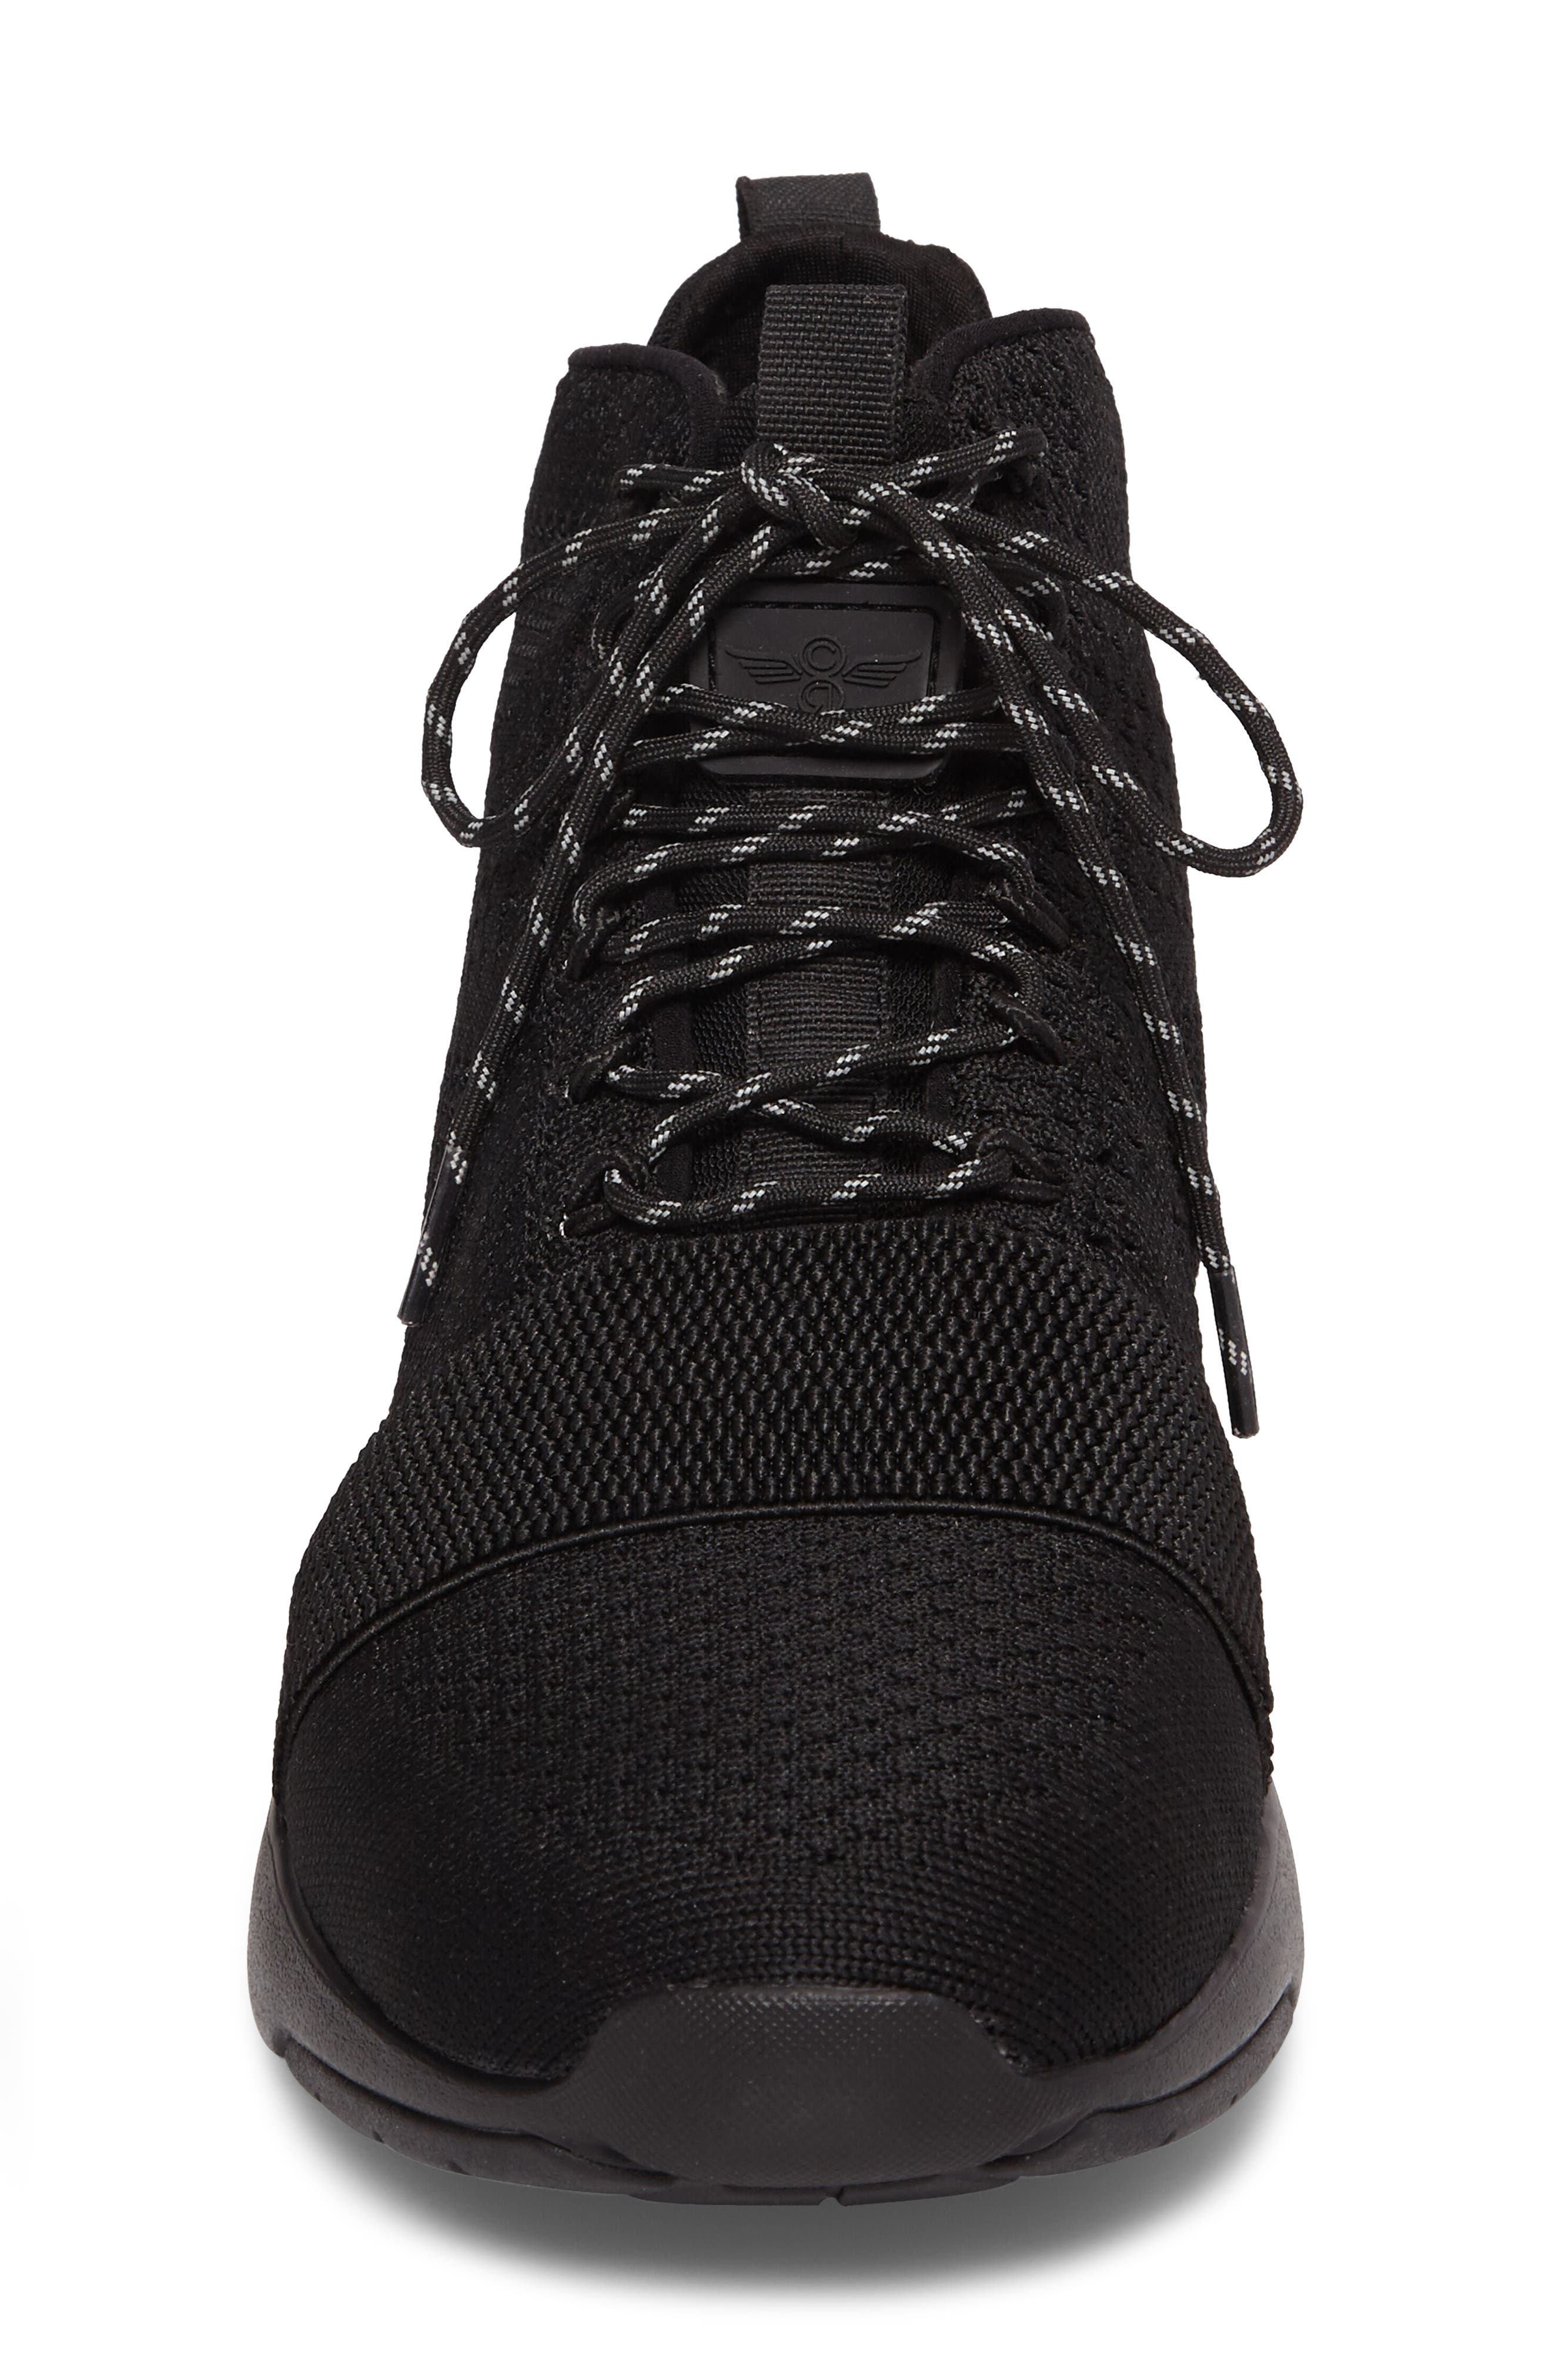 Modica Sneaker,                             Alternate thumbnail 4, color,                             012